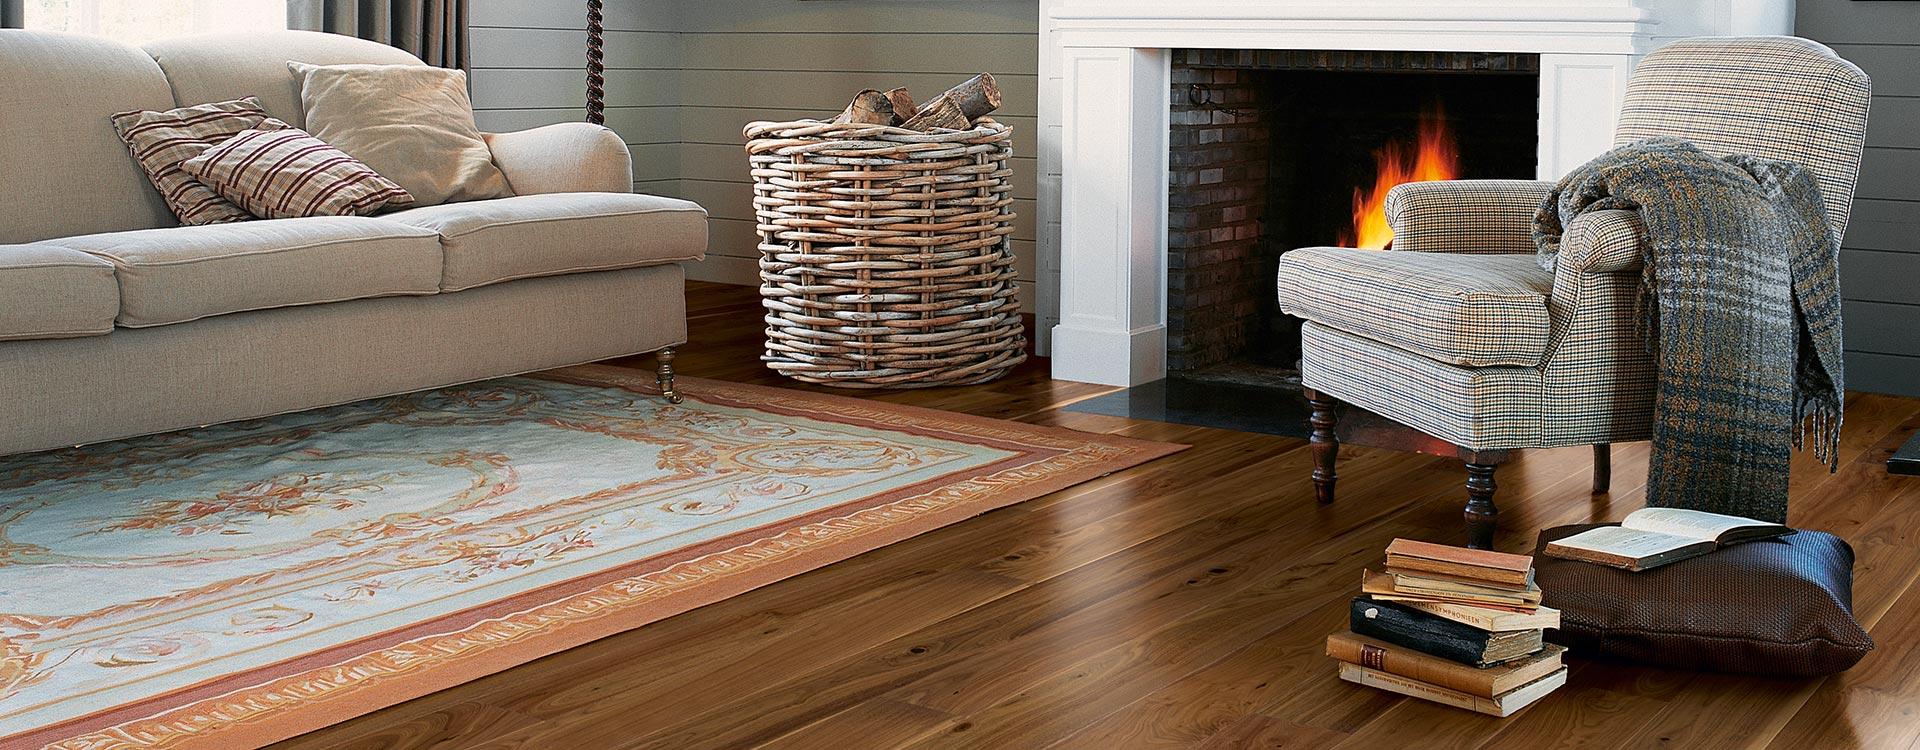 Why You Will Love Walnut Flooring, Quickstep Walnut Laminate Flooring